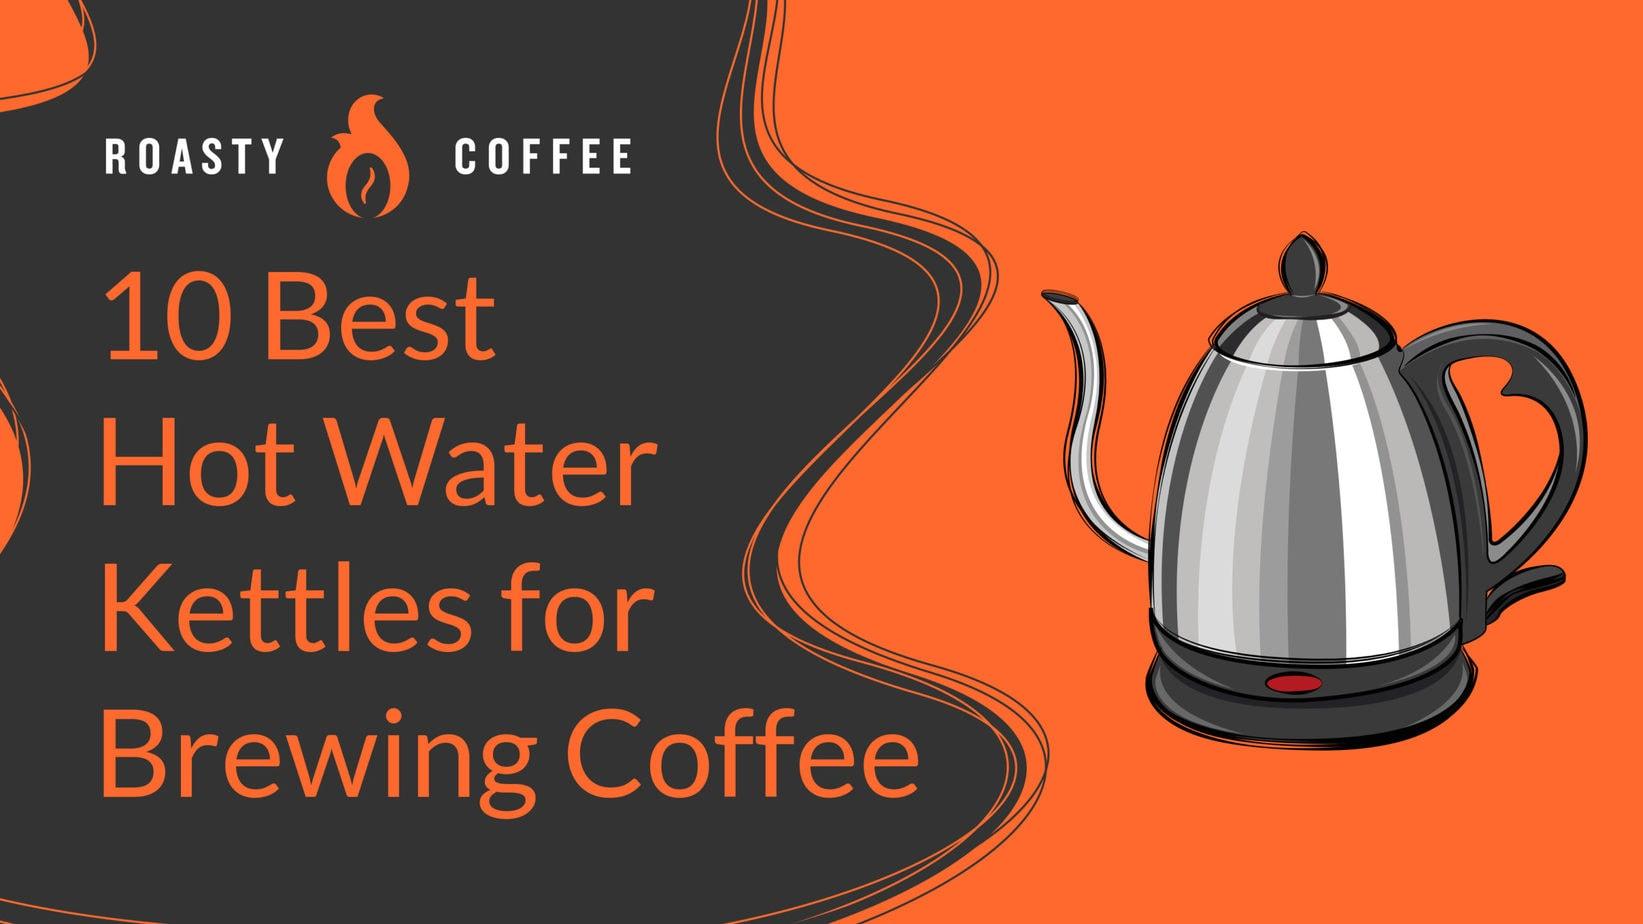 Hot Water Kettles